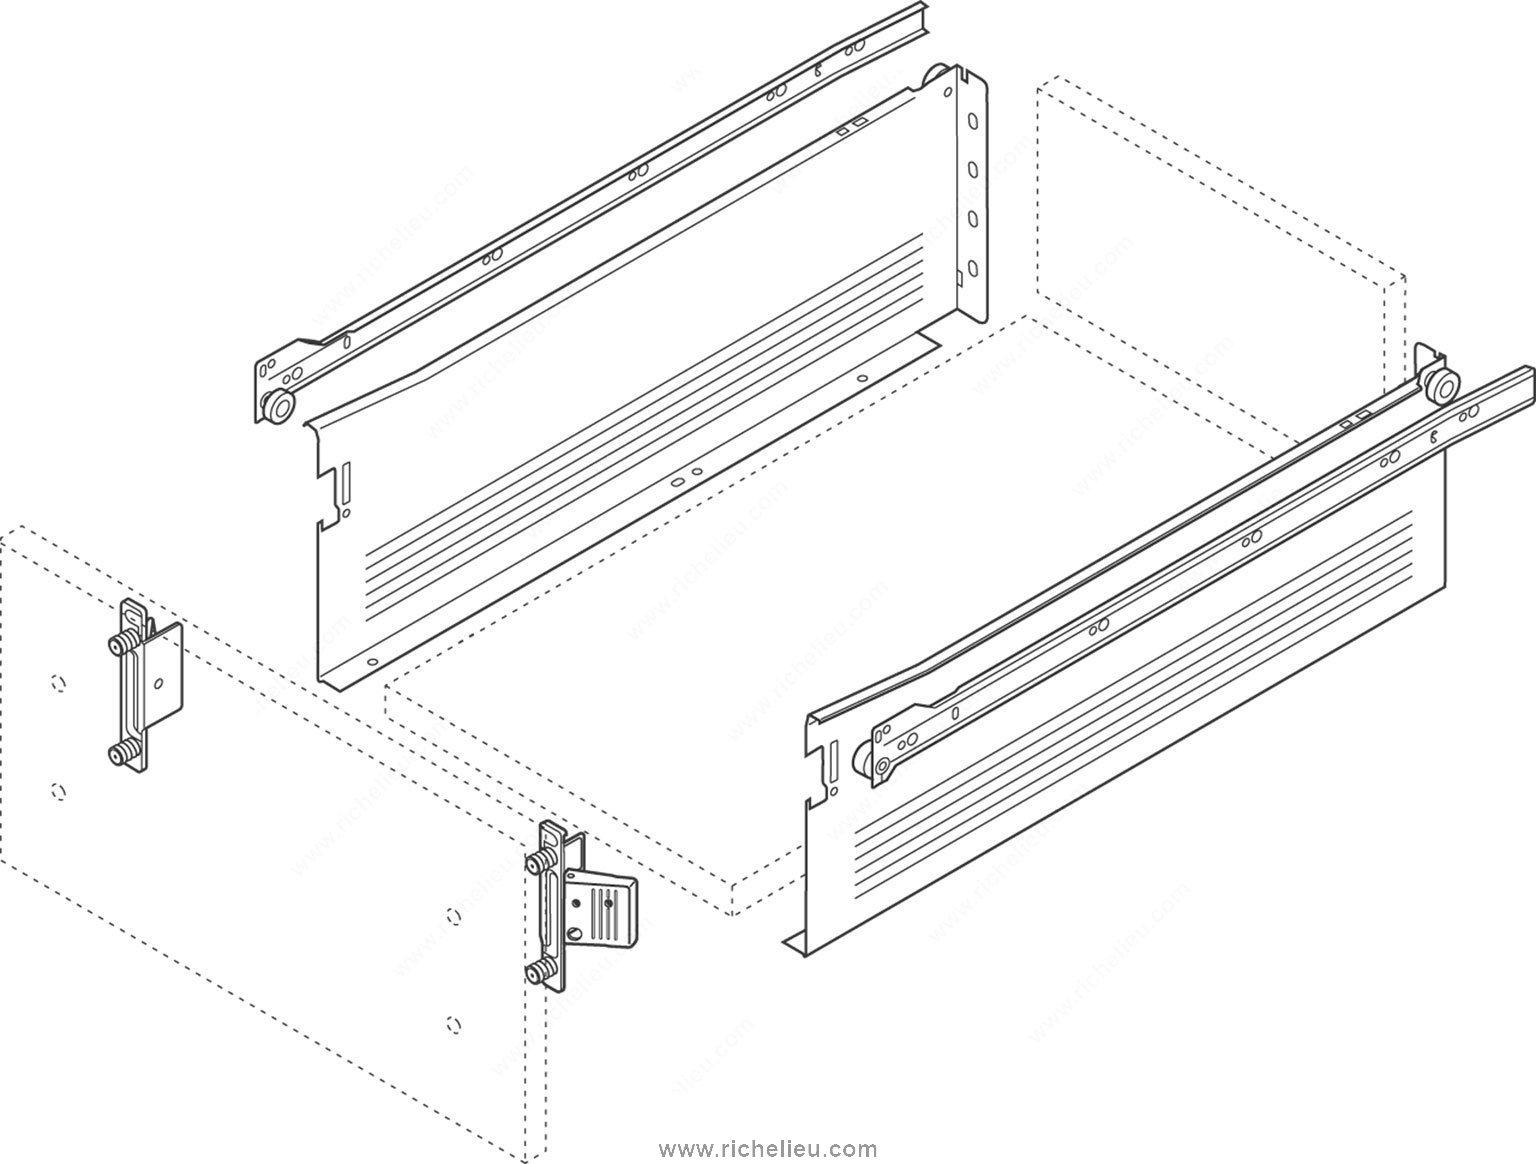 Metabox Kits Single Extension